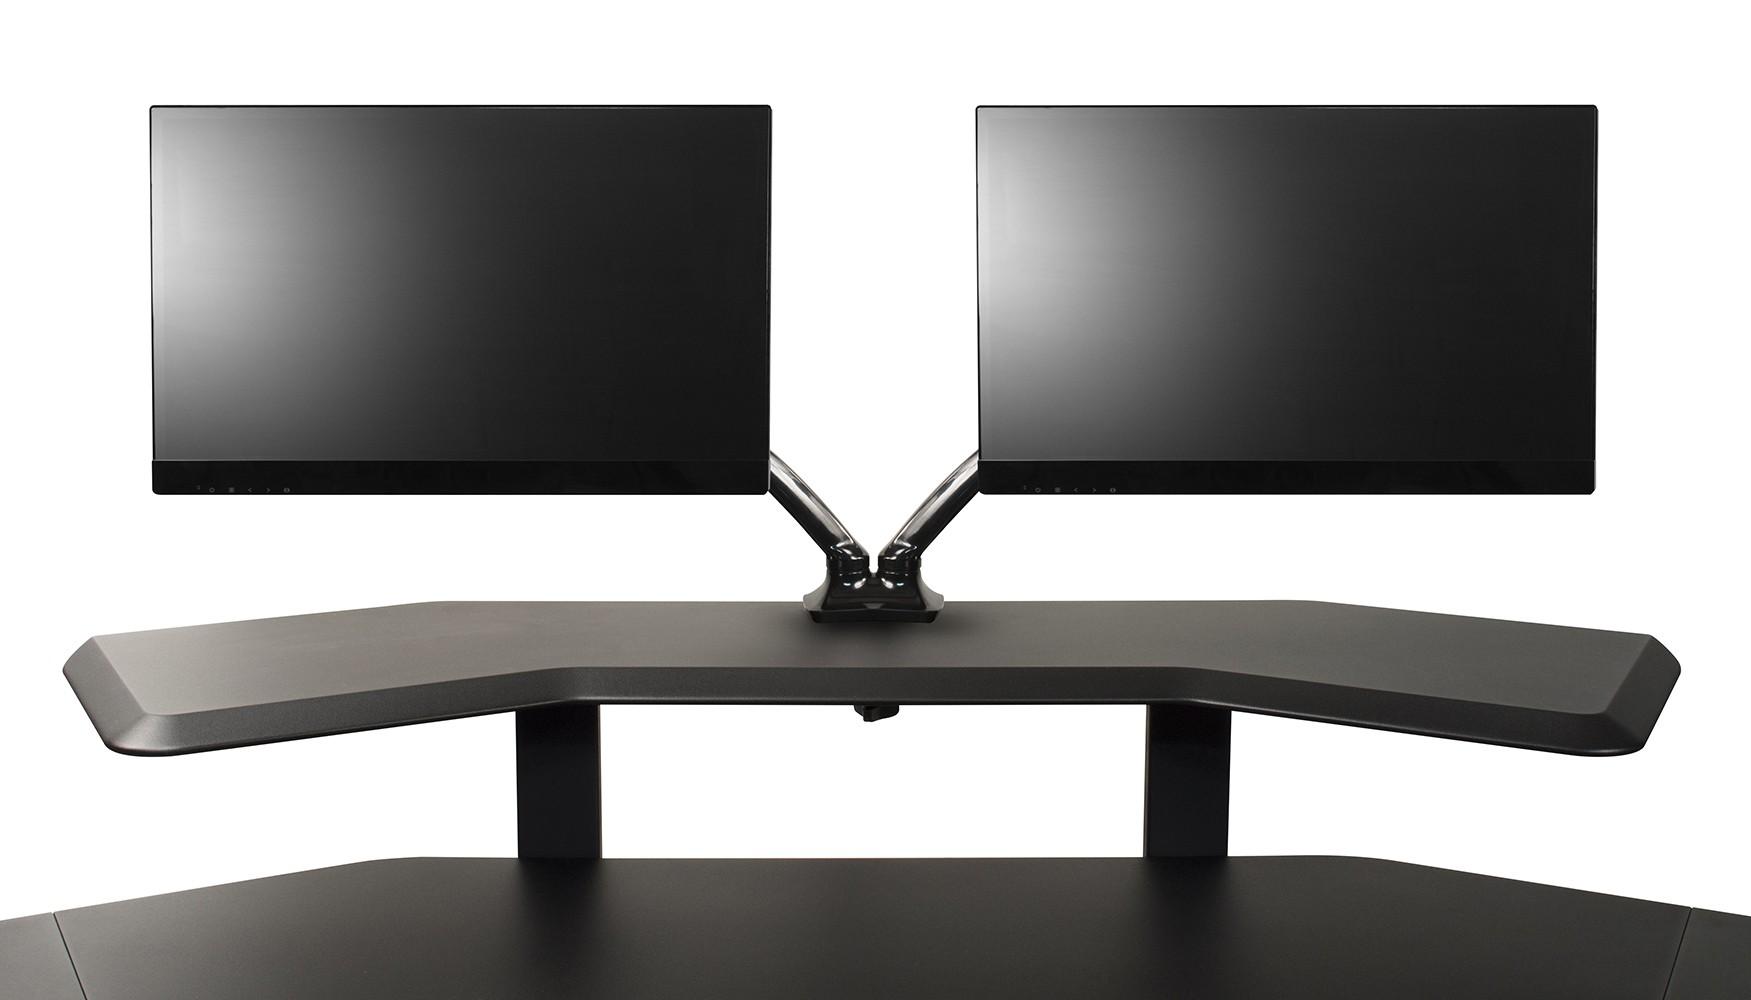 Pleasant Ultimate Support Nuc Mm2 Studio Desk Double Monitor Mount Full Compass Download Free Architecture Designs Xoliawazosbritishbridgeorg